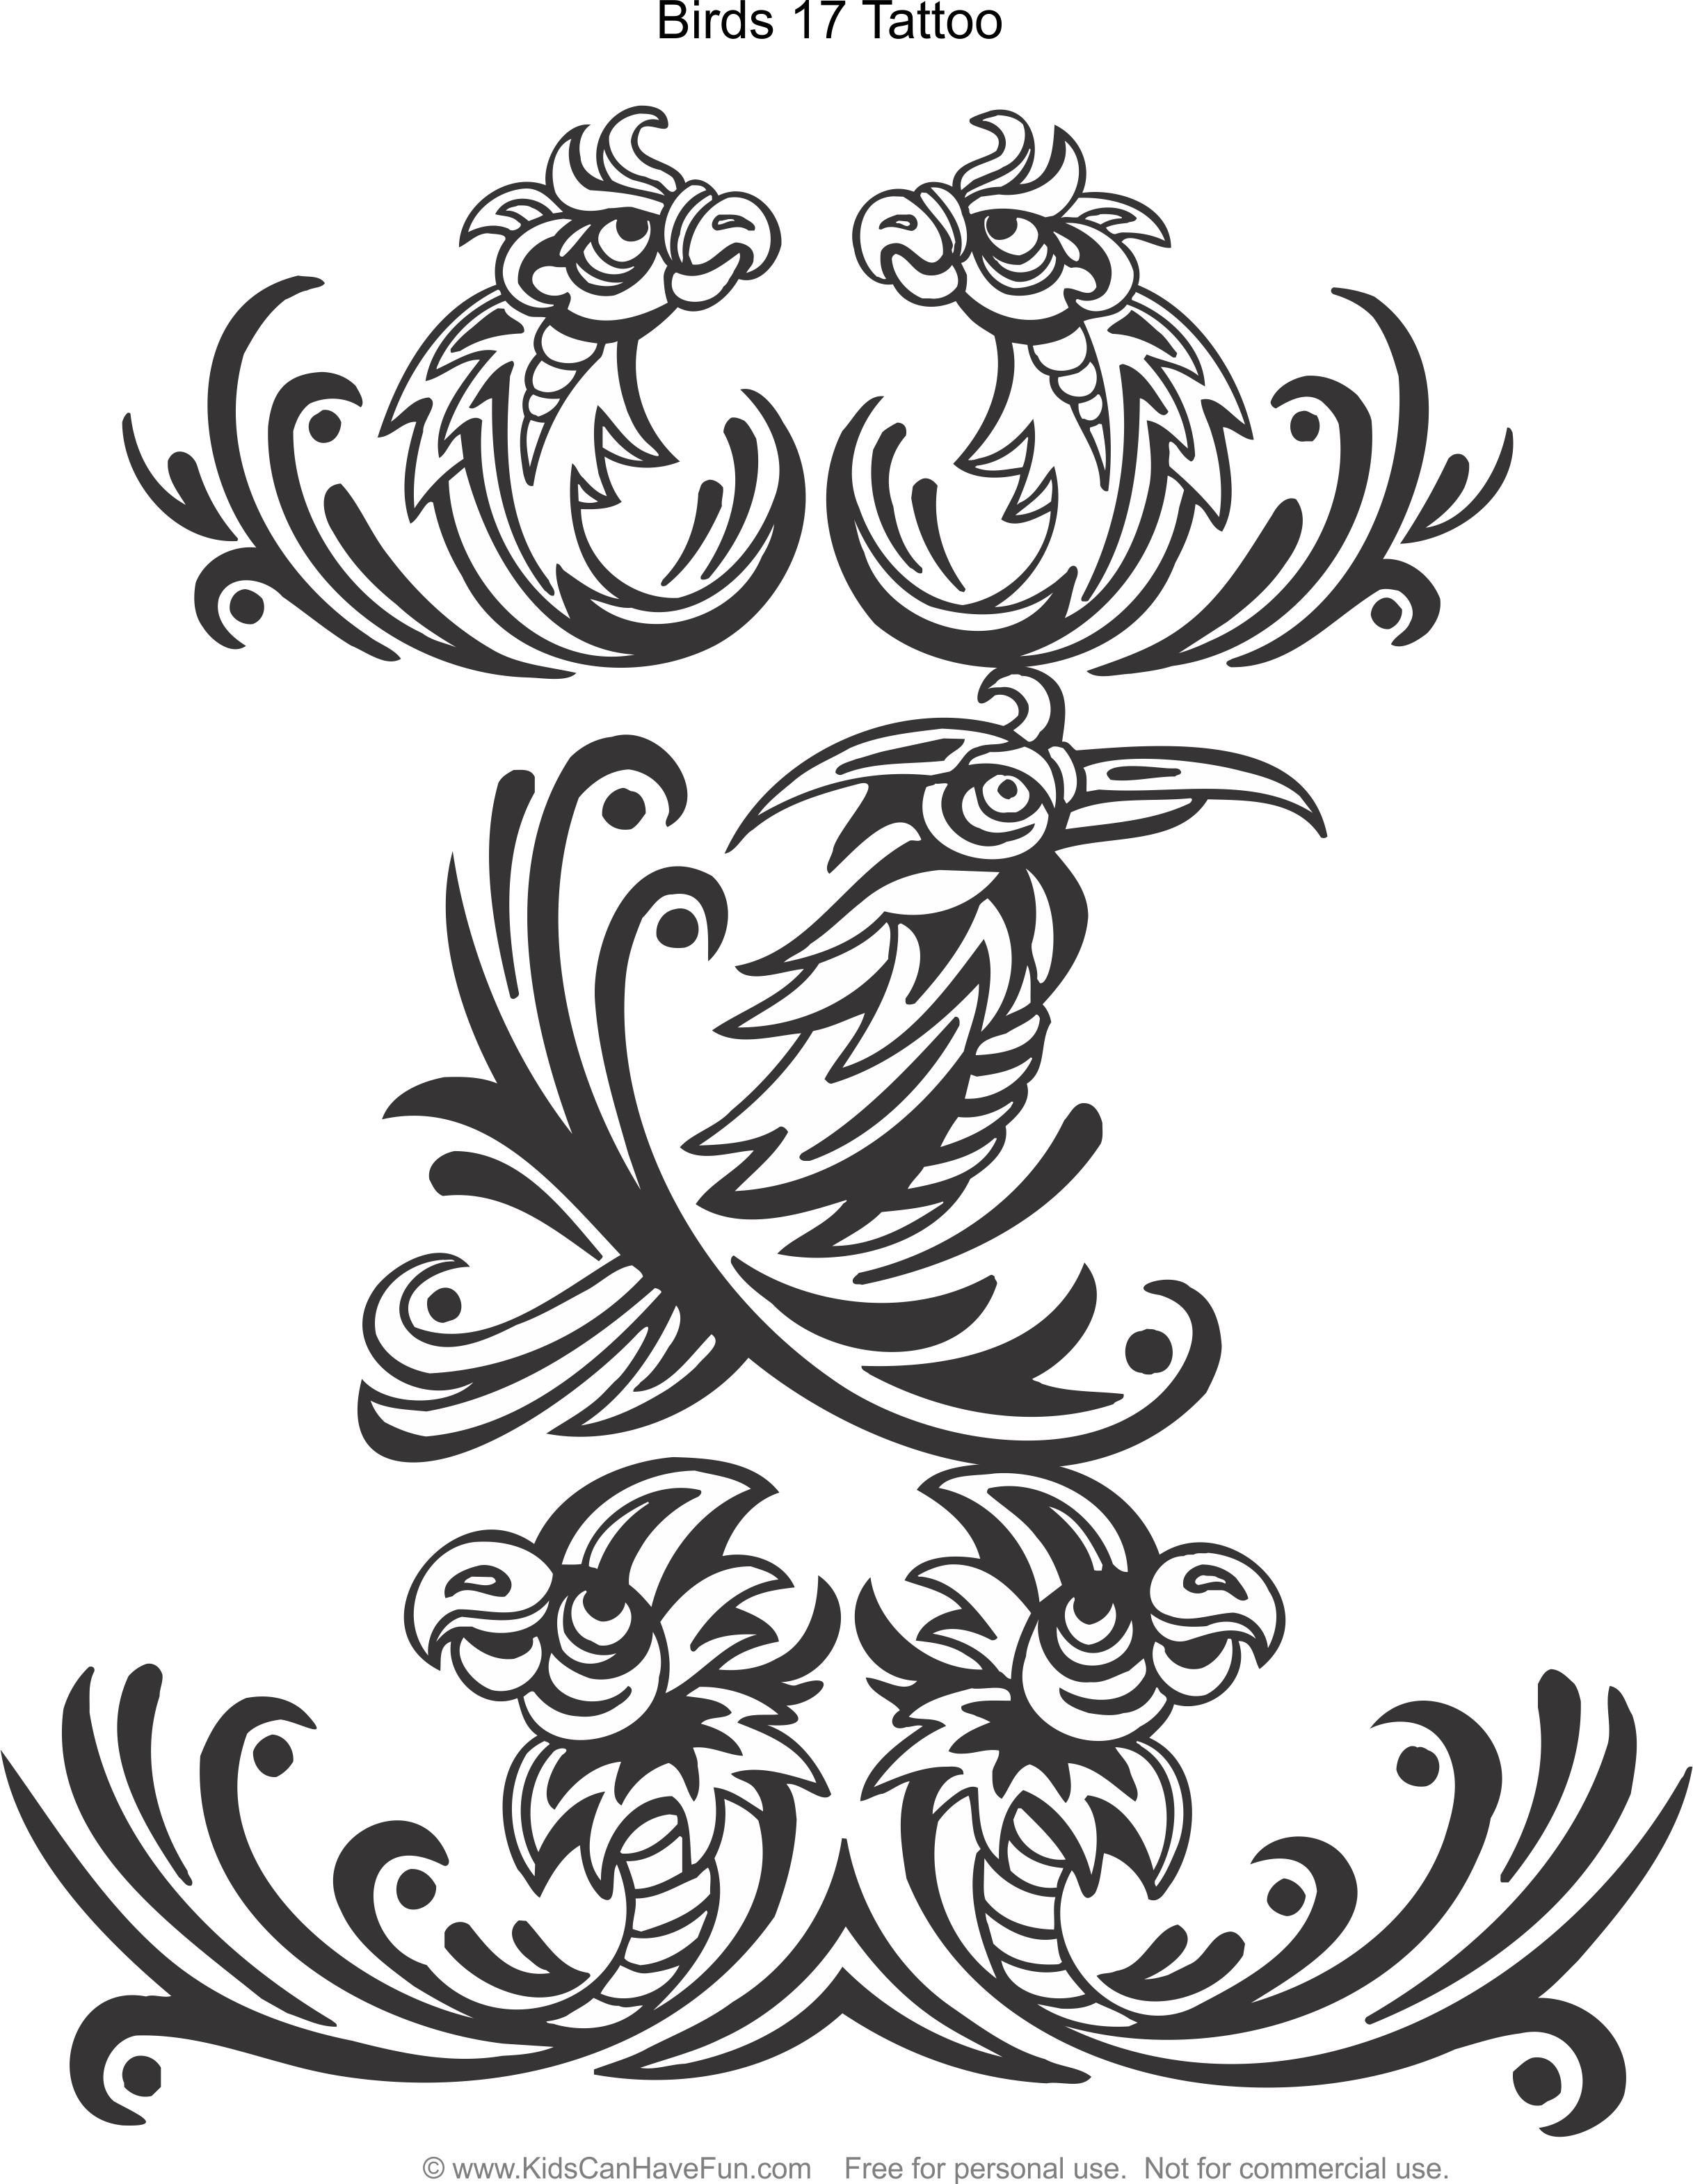 Birds 17 Tattoo Design Coloring Page Kidscanhavefun Coloringhtm Bird Color